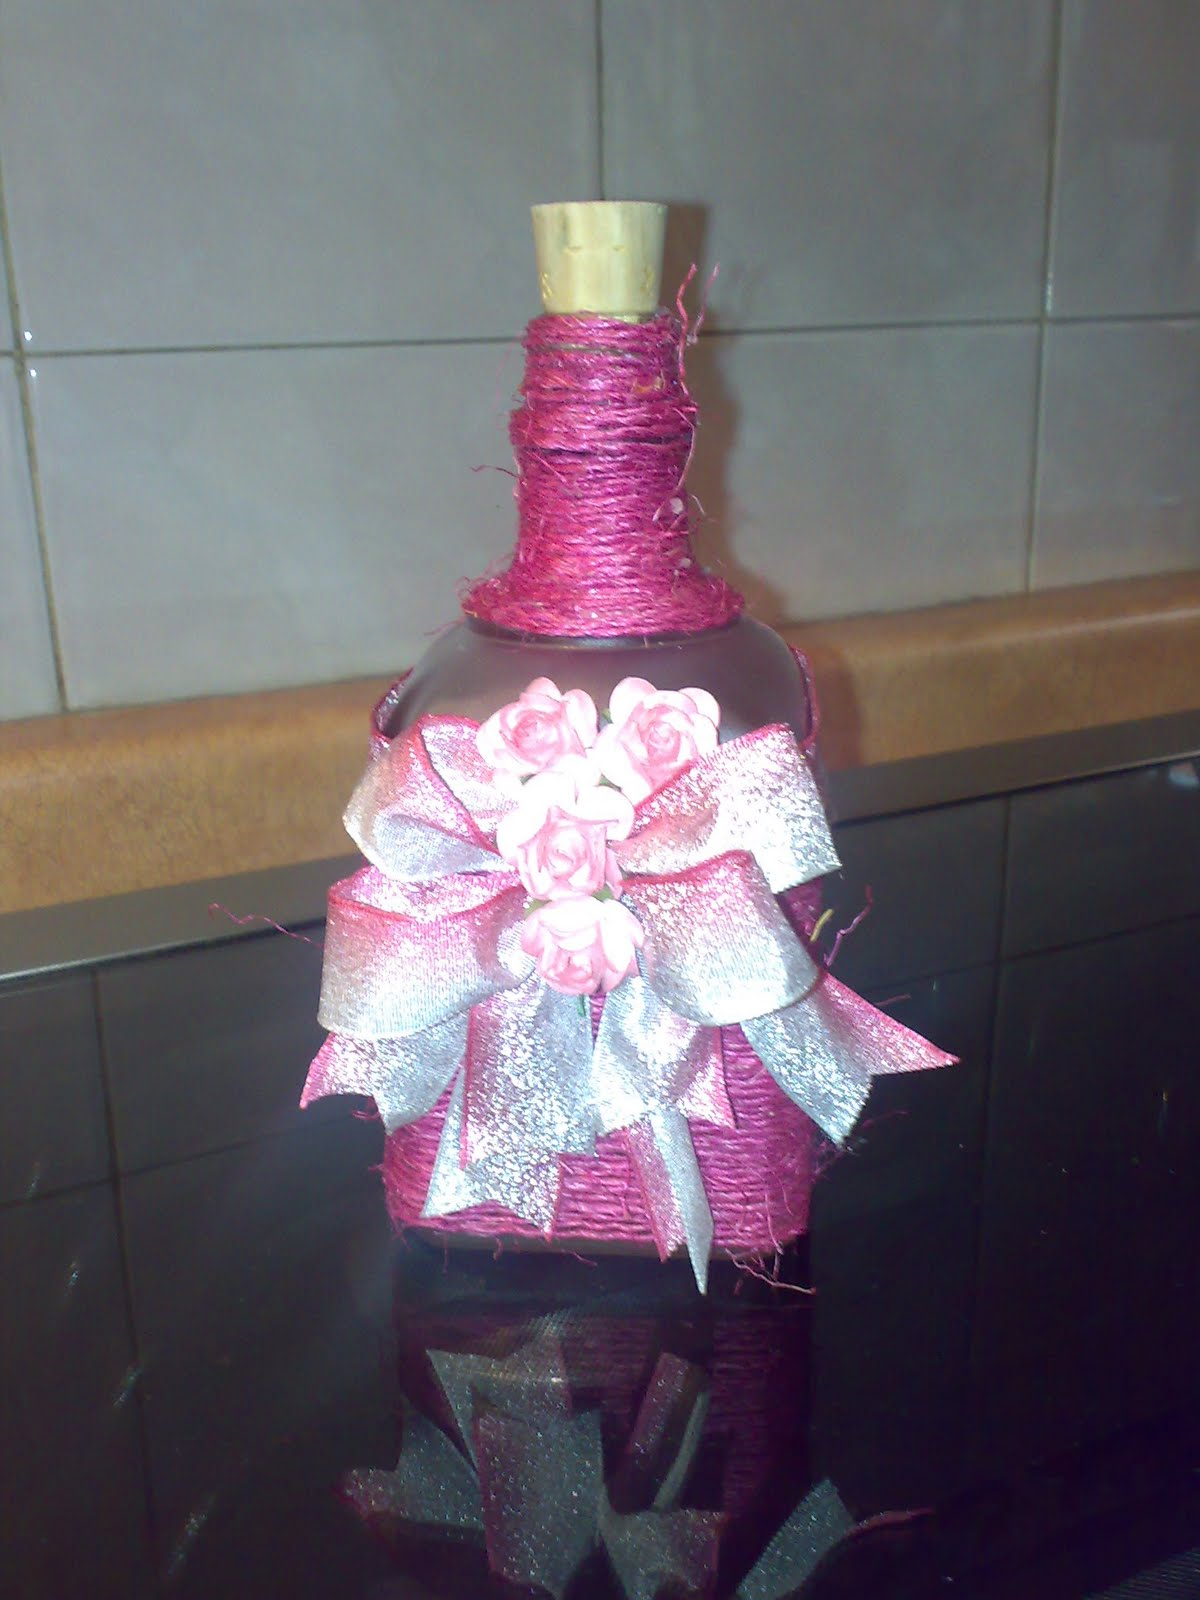 Pin decoracion de botellas pelautscom on pinterest - Decoracion de botellas ...